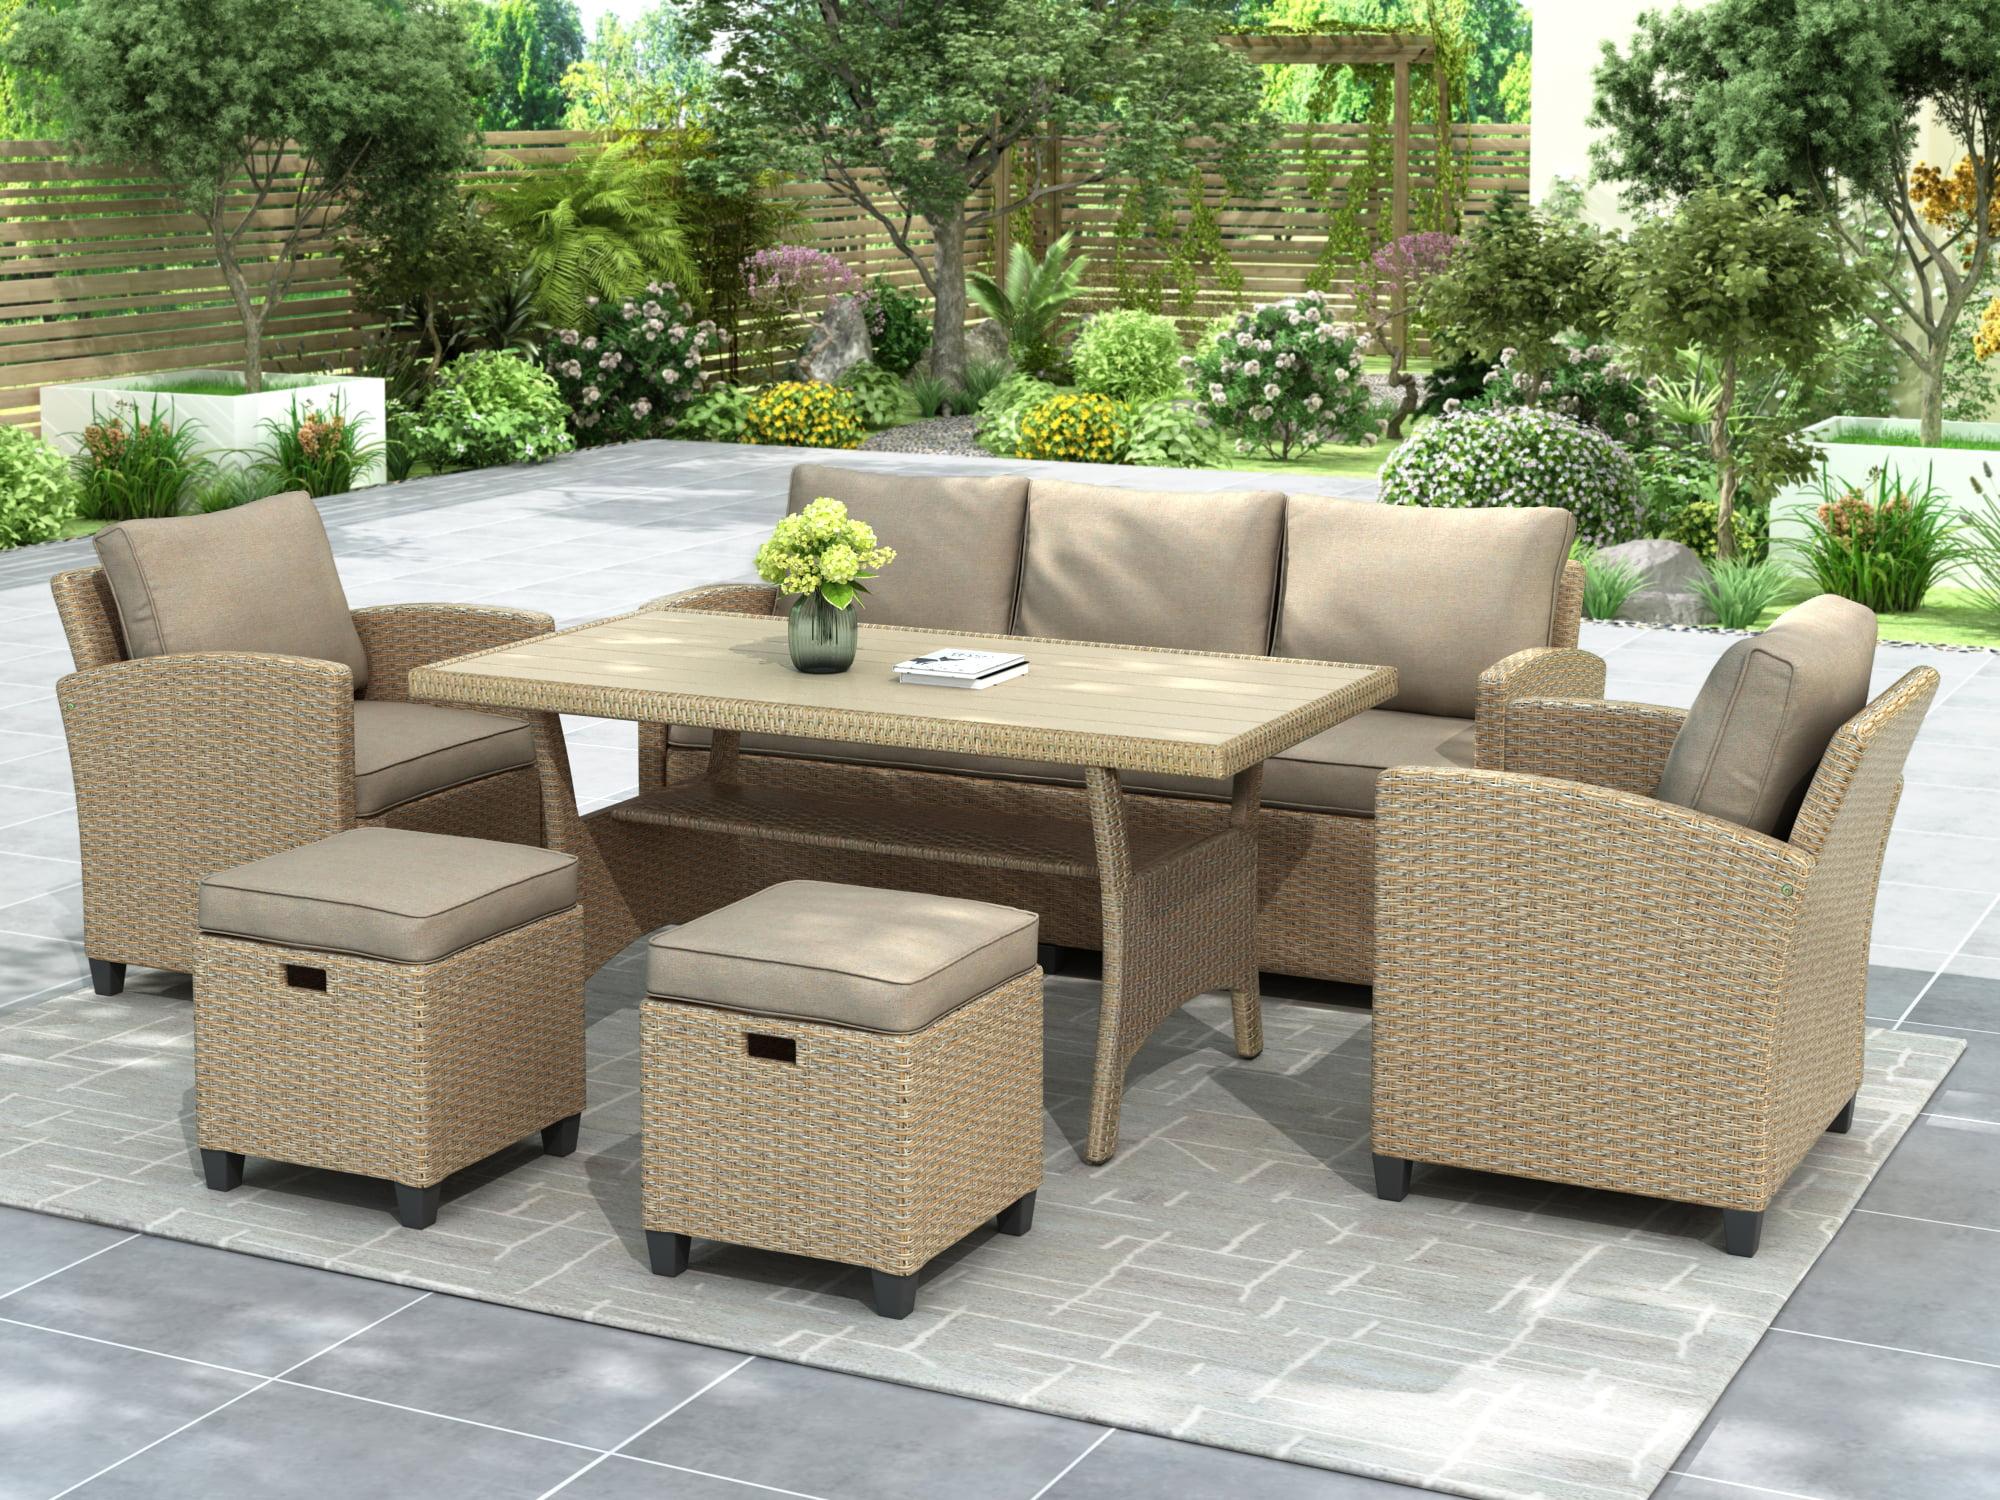 Outdoor Patio Dining Set, 6 Piece Wicker Furniture Set ...